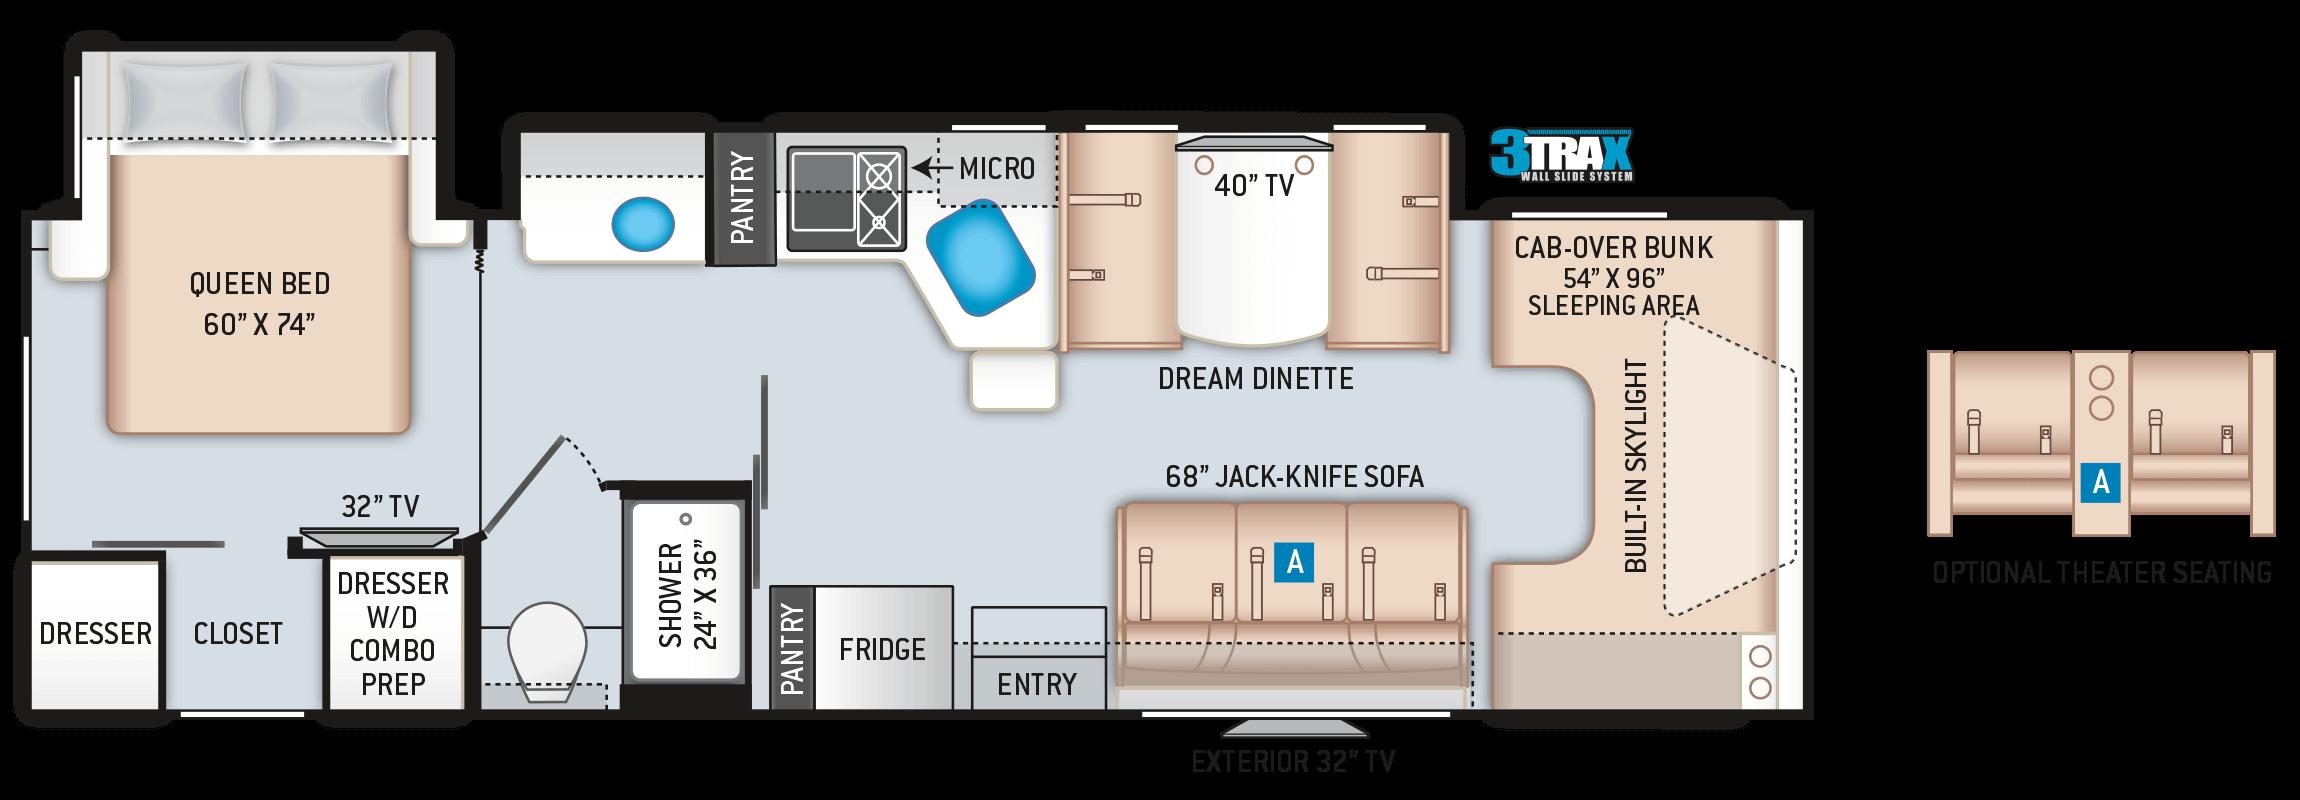 Quantum JM31 Class C Floor Plan